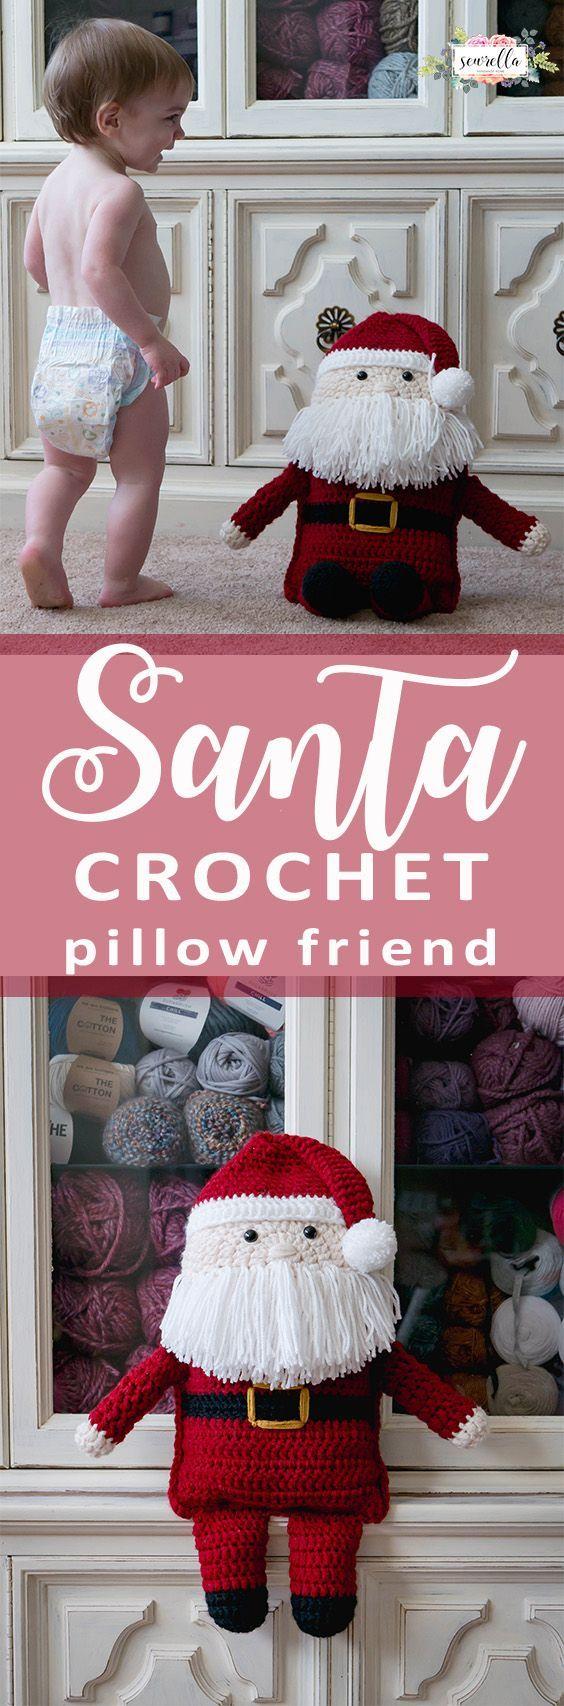 956 best Christmas Crochet images on Pinterest | Holiday crochet ...